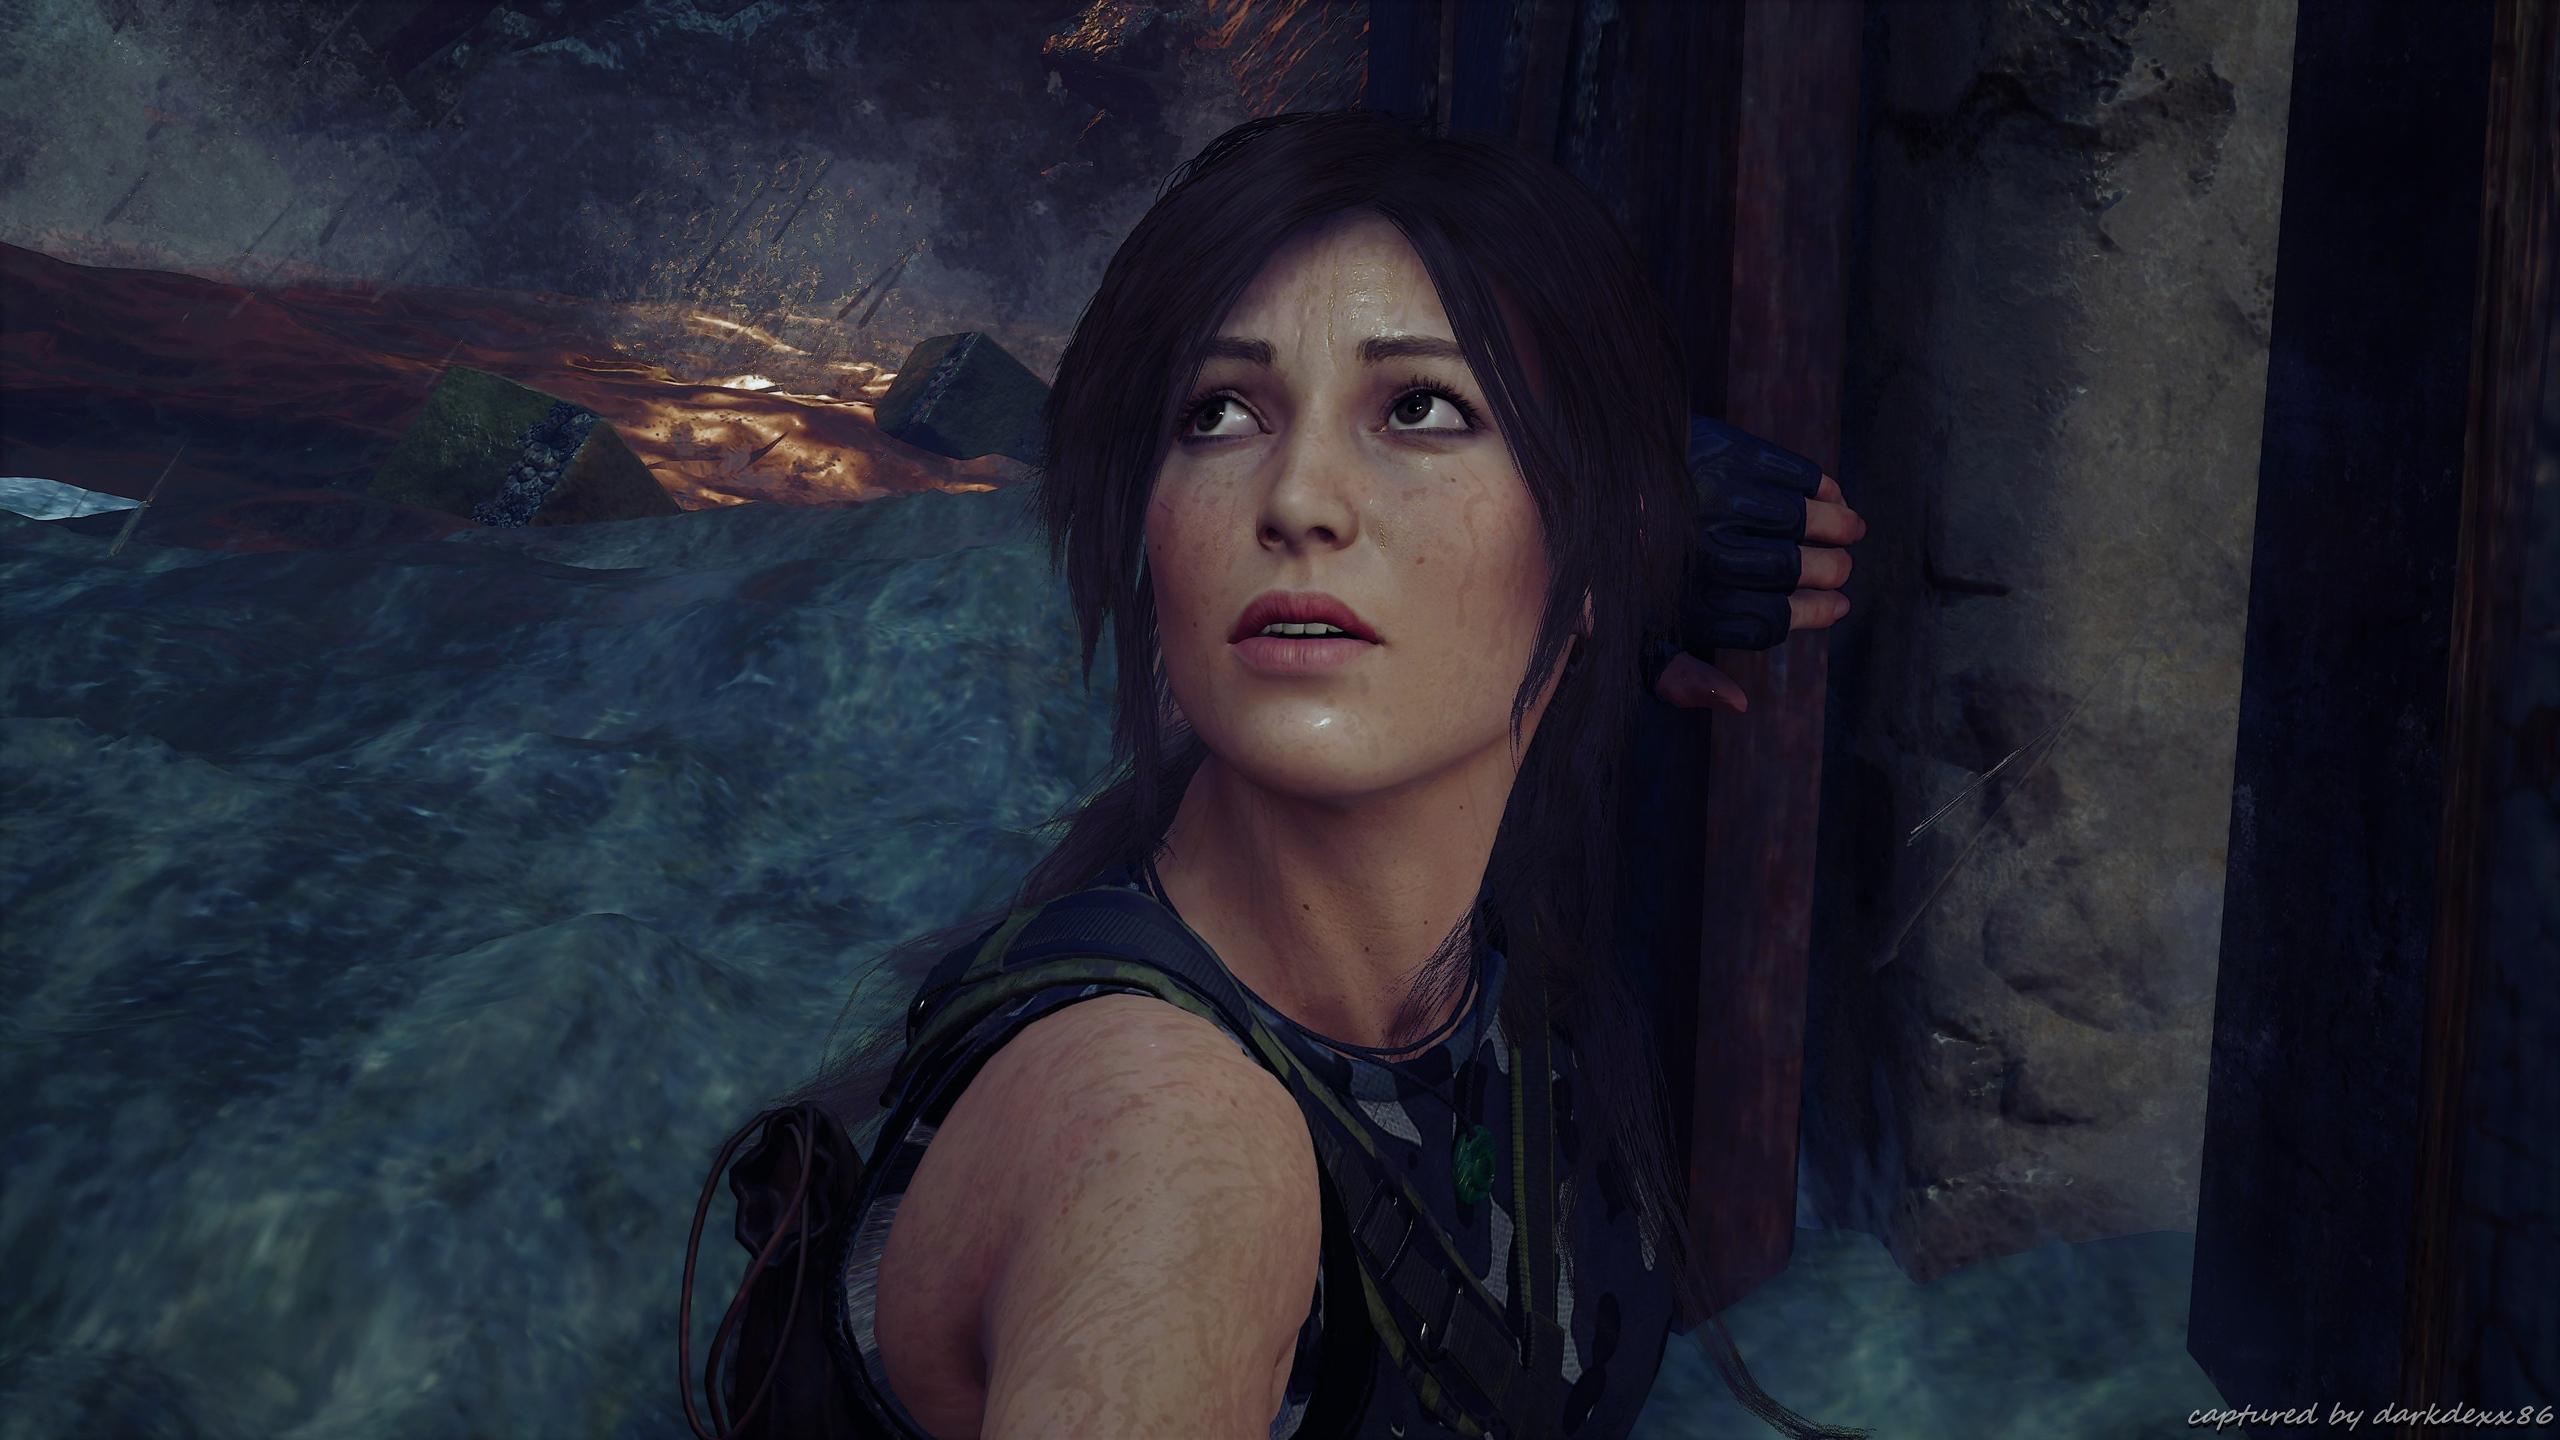 2560x1440 Shadow Of The Tomb Raider Lara Croft 4k 1440p Resolution